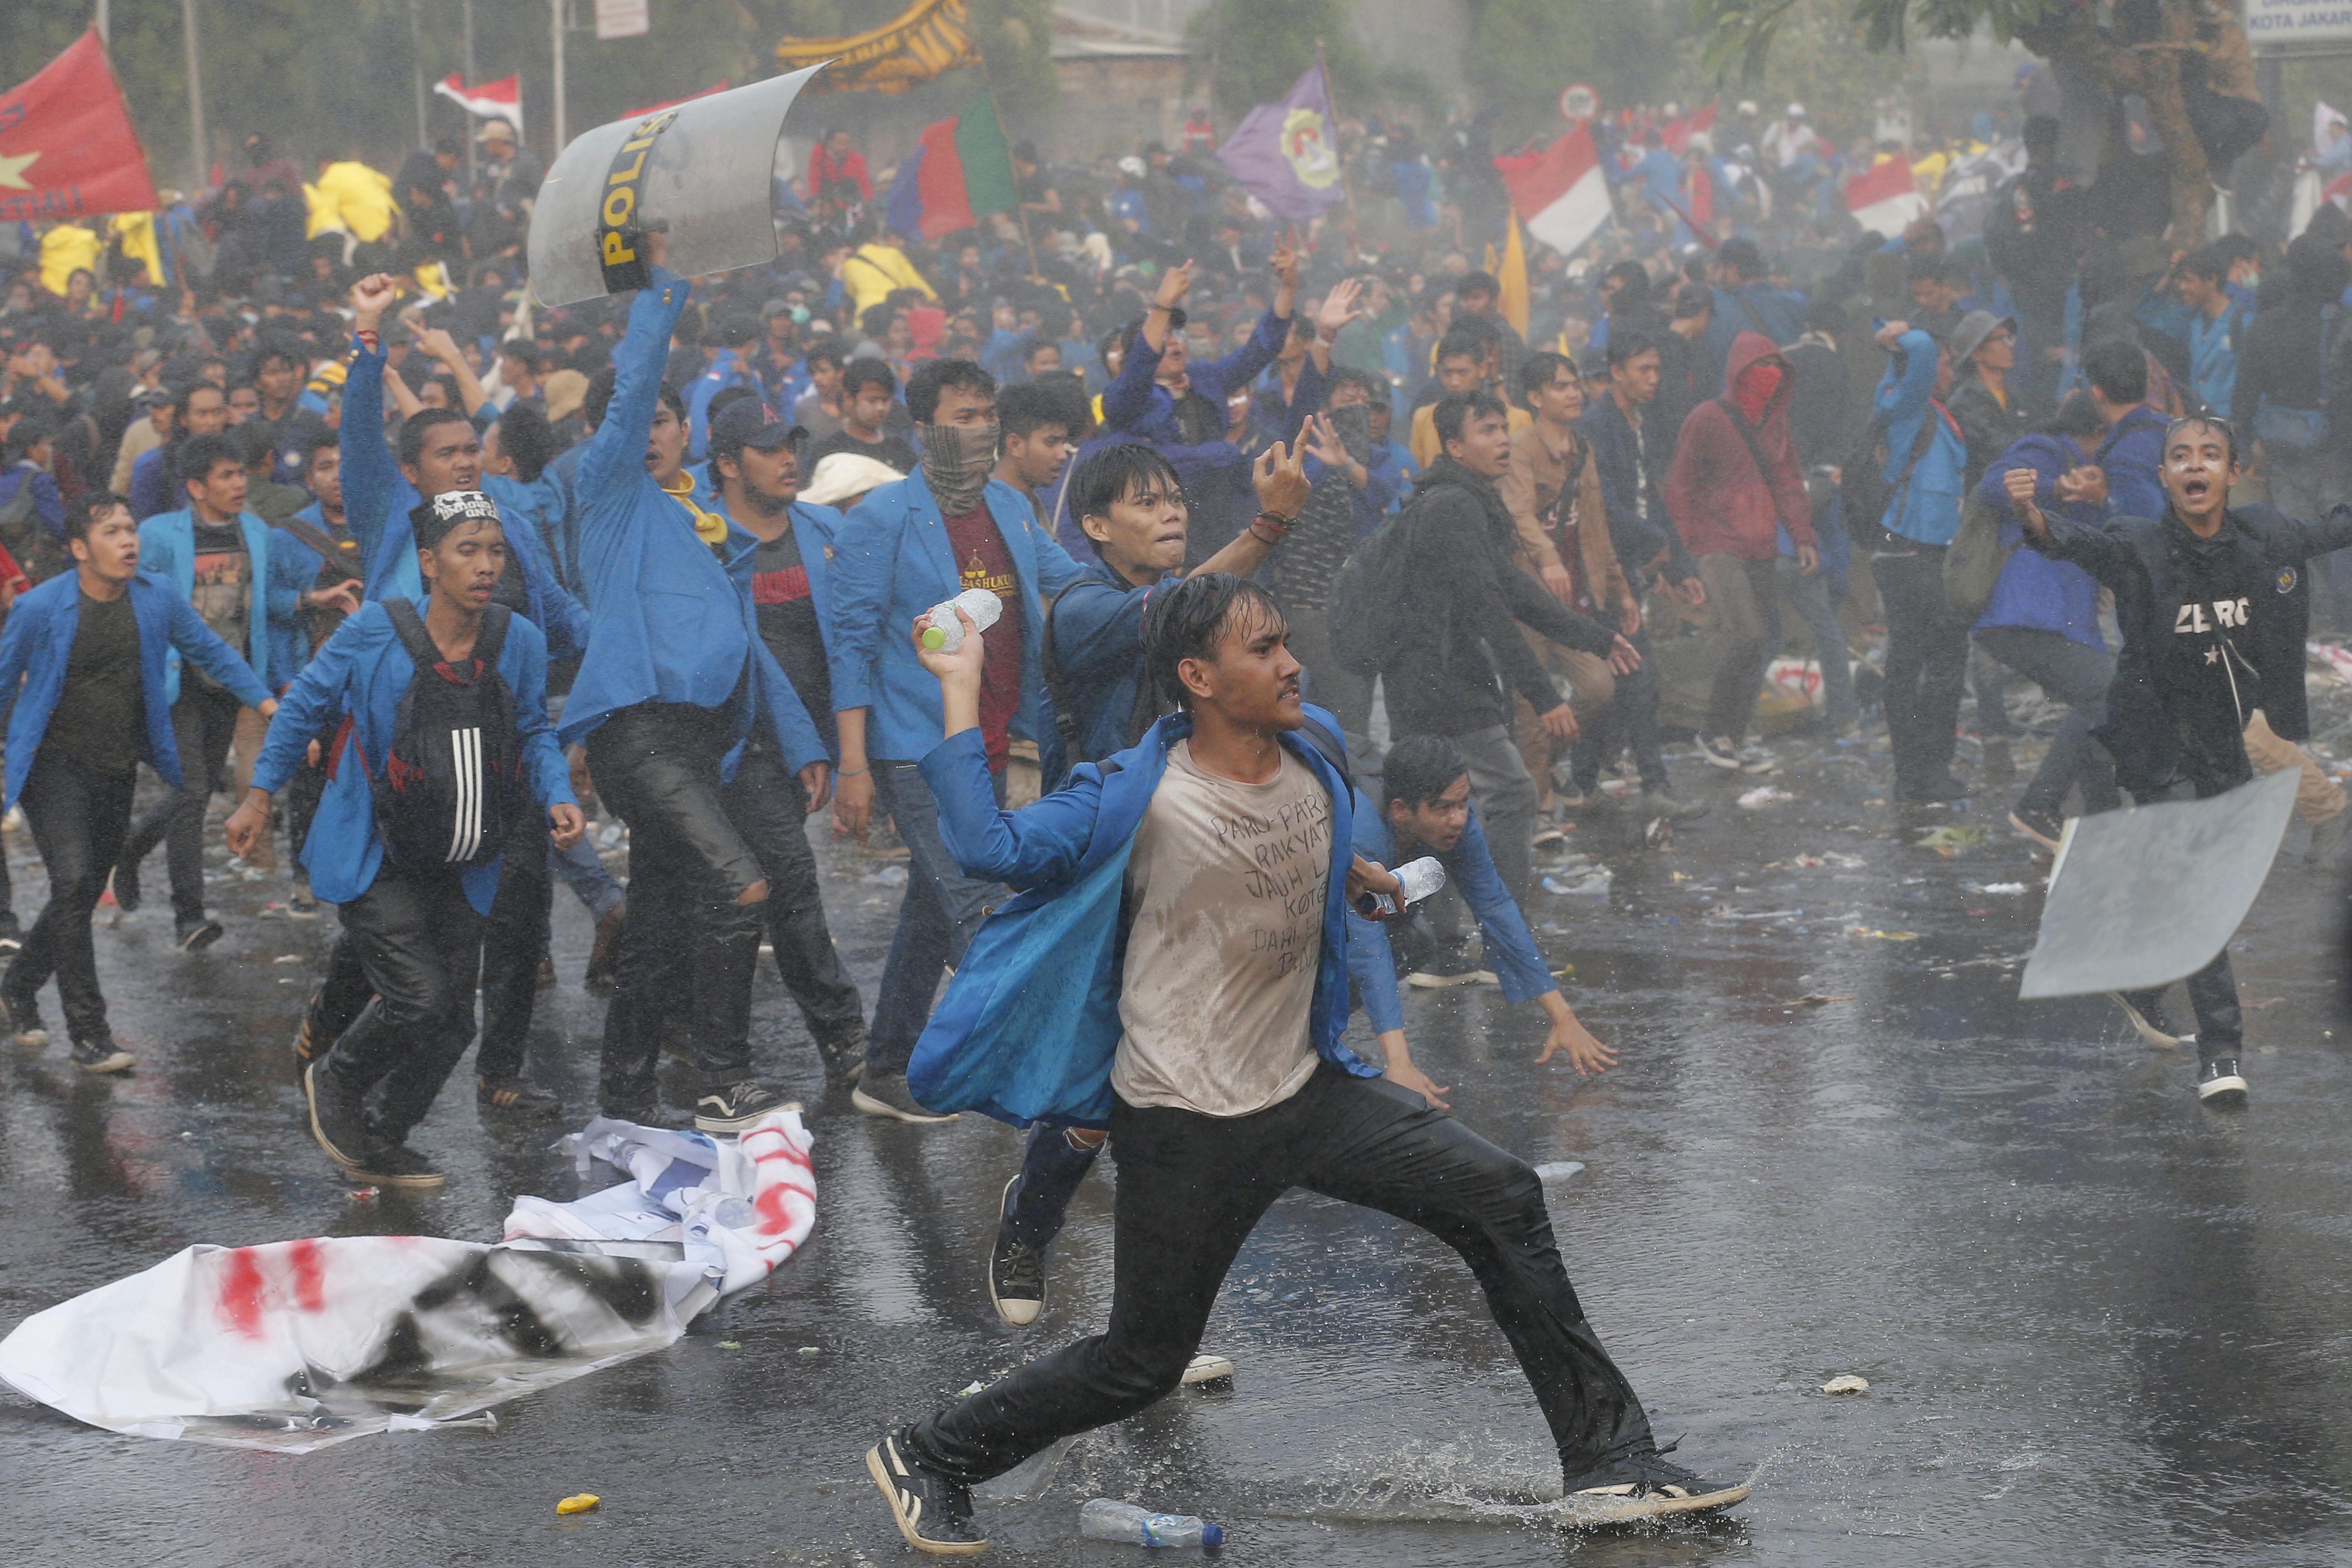 20190925 Indonesia protest.jpg